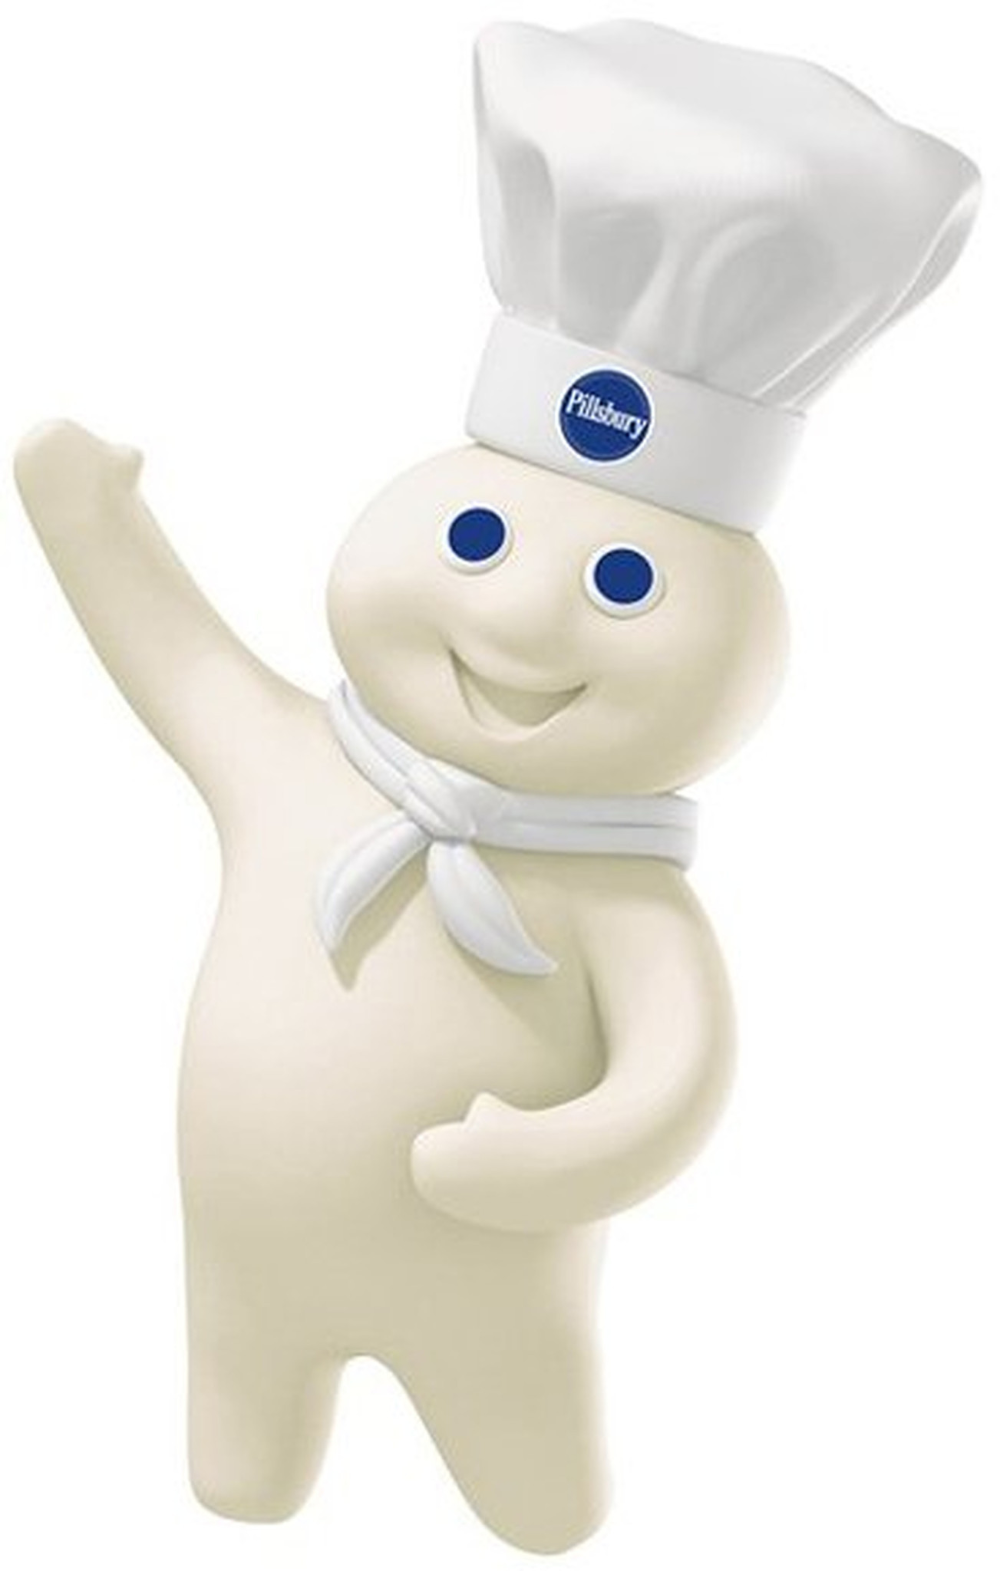 Pillsbury Doughboy Screenshots Images And Pictures Comic Vine Pillsbury Doughboy Boy Doll Pillsbury